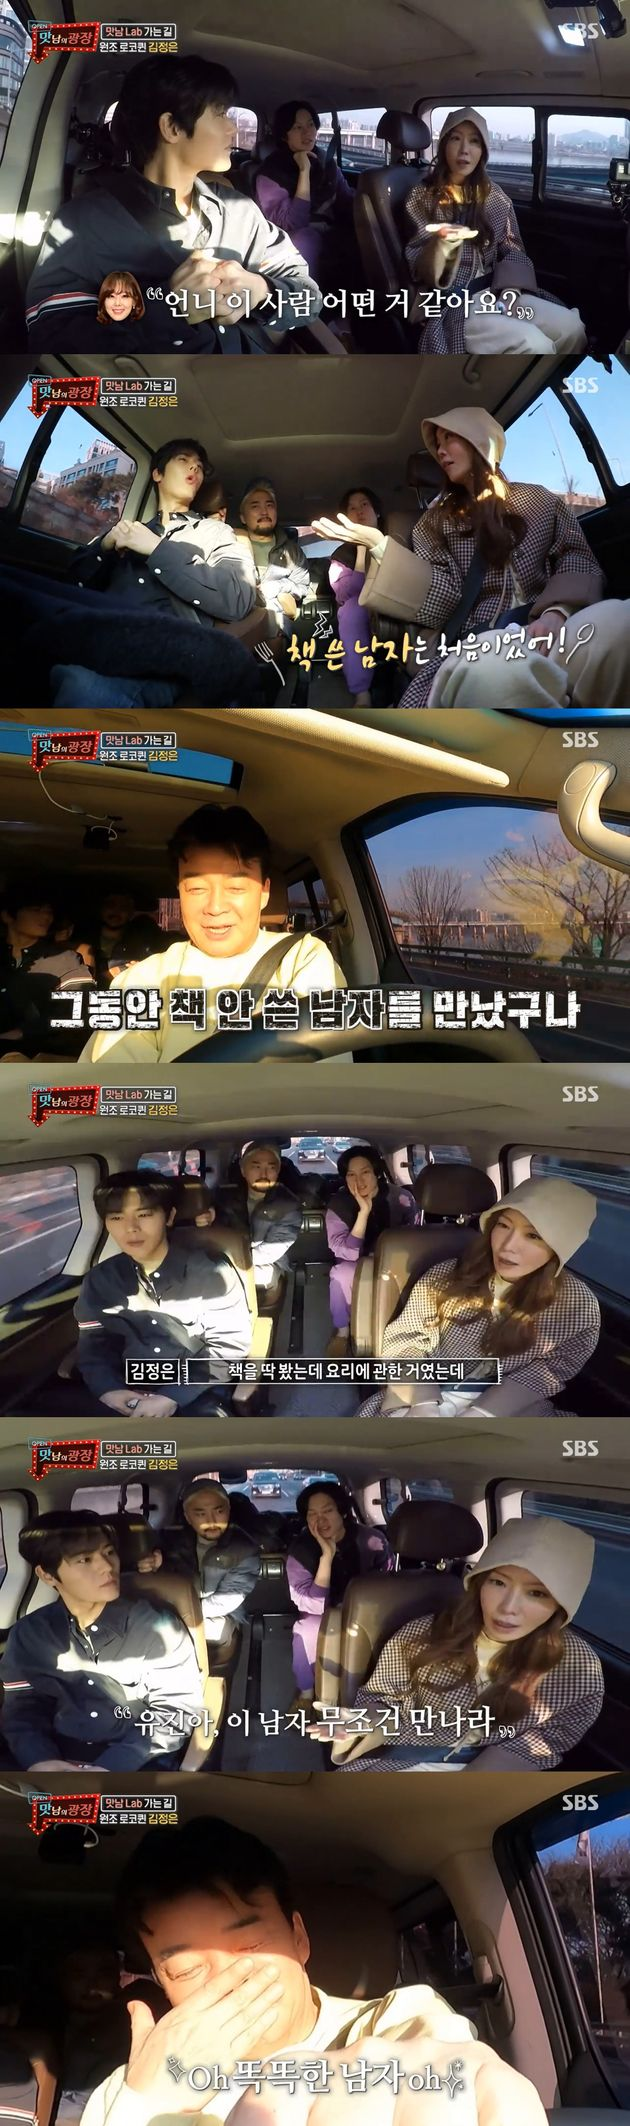 SBS '맛남의